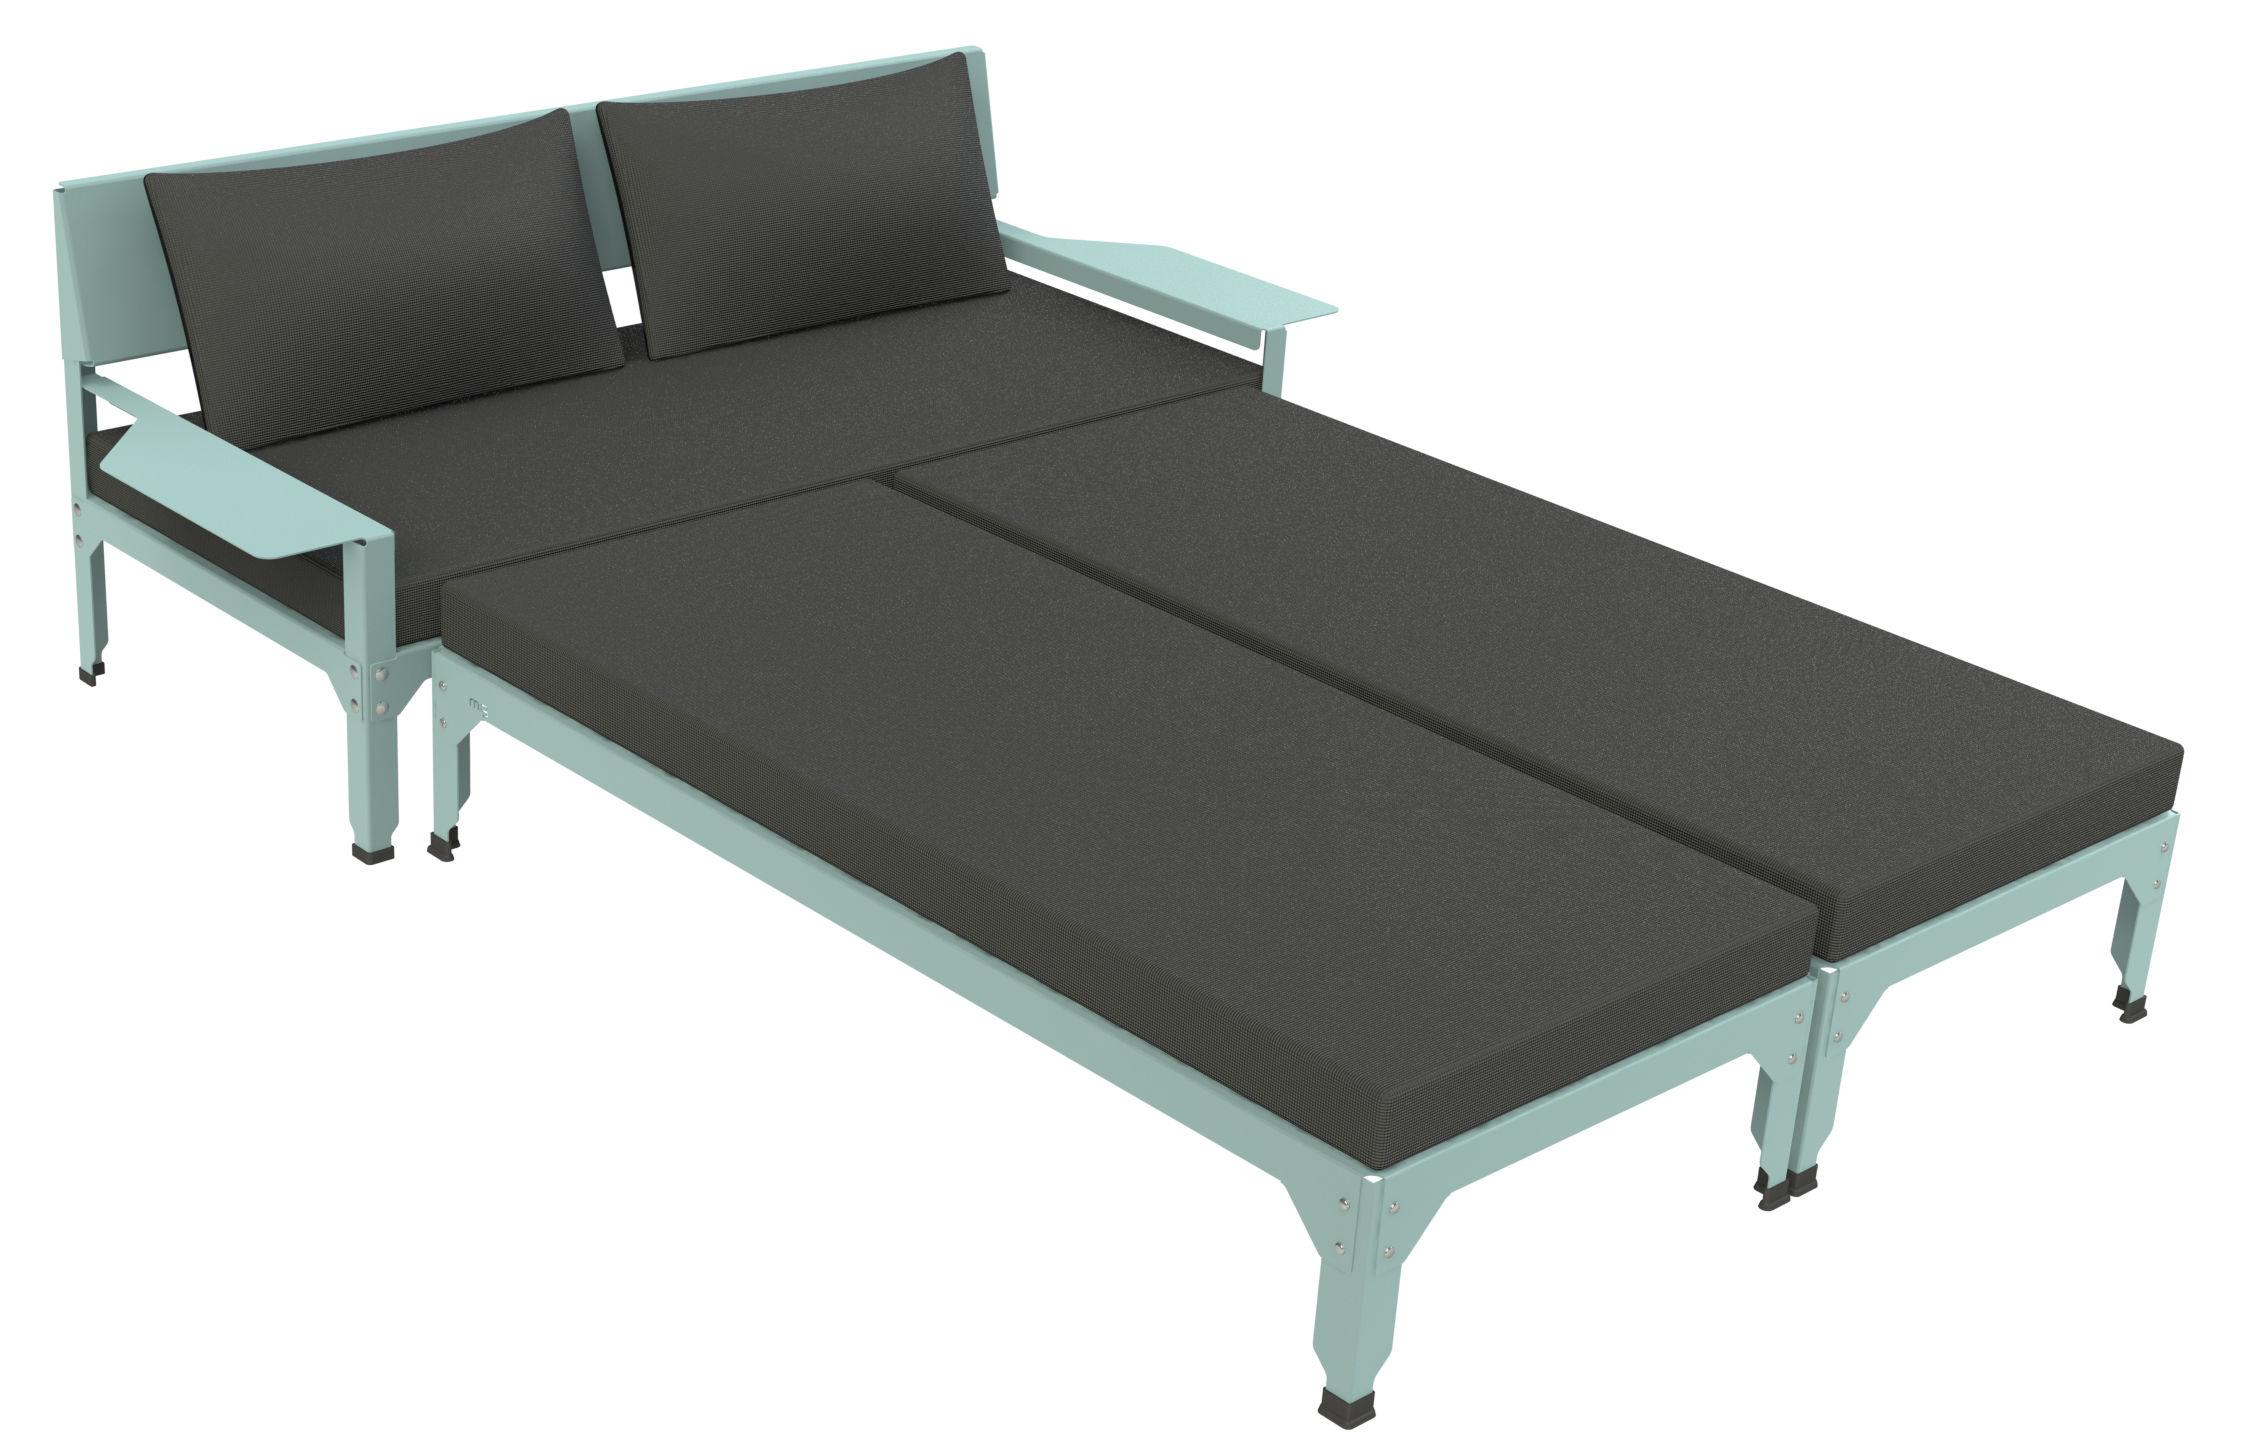 Pouf - / Estensione per divano Lounge Hegoa - 145 x 65 cm - Indoor ...